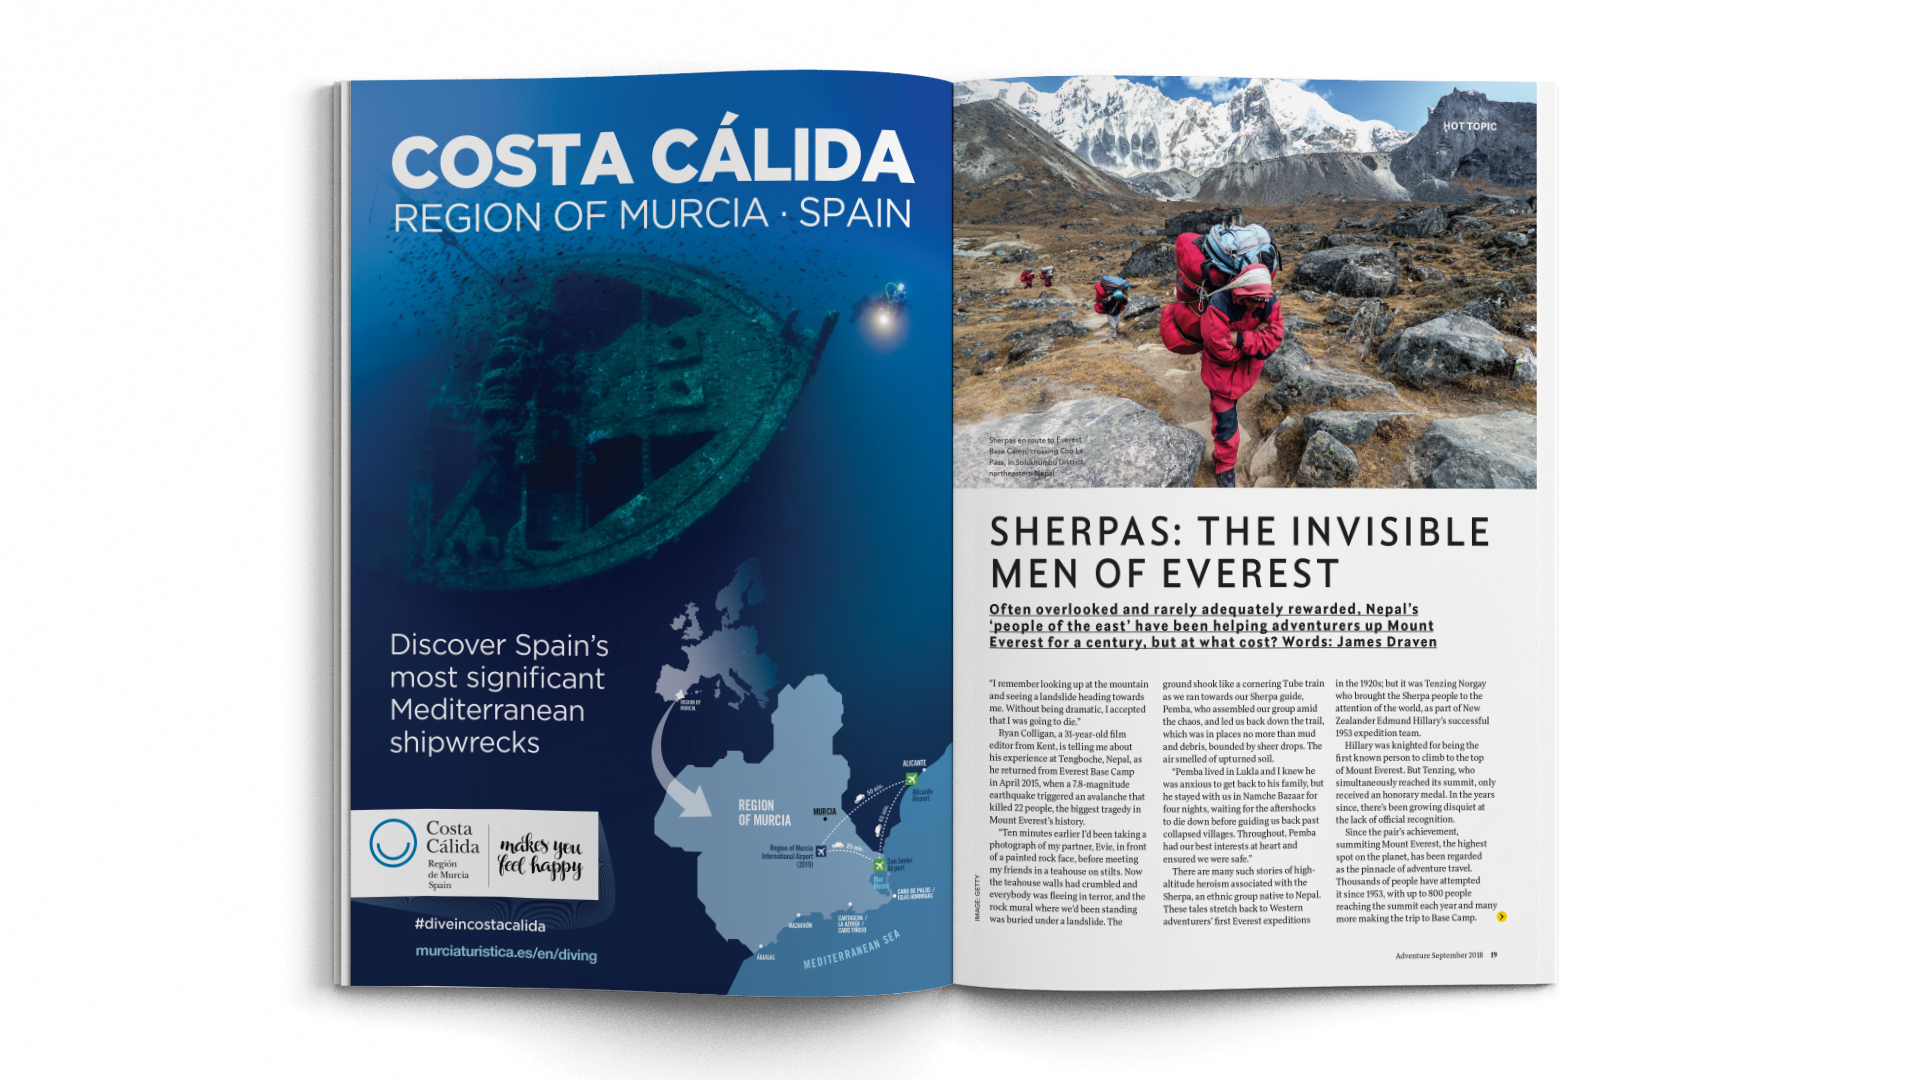 A4-Magazine-DPS-NGT-ADV-Sherpas-1